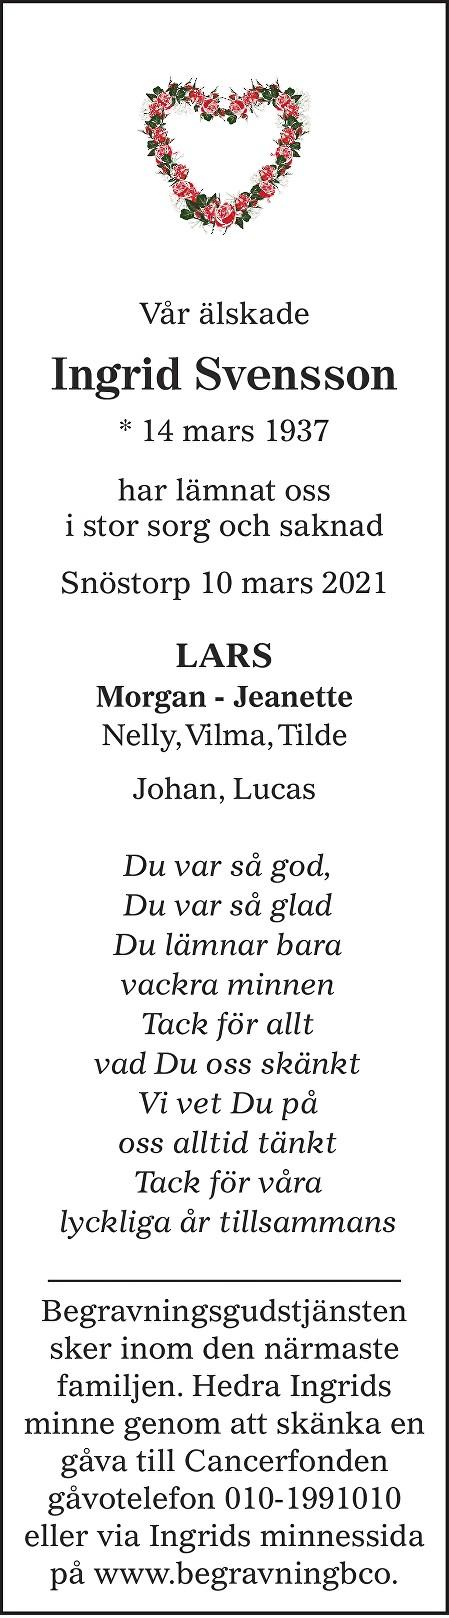 Ingrid Svensson Death notice